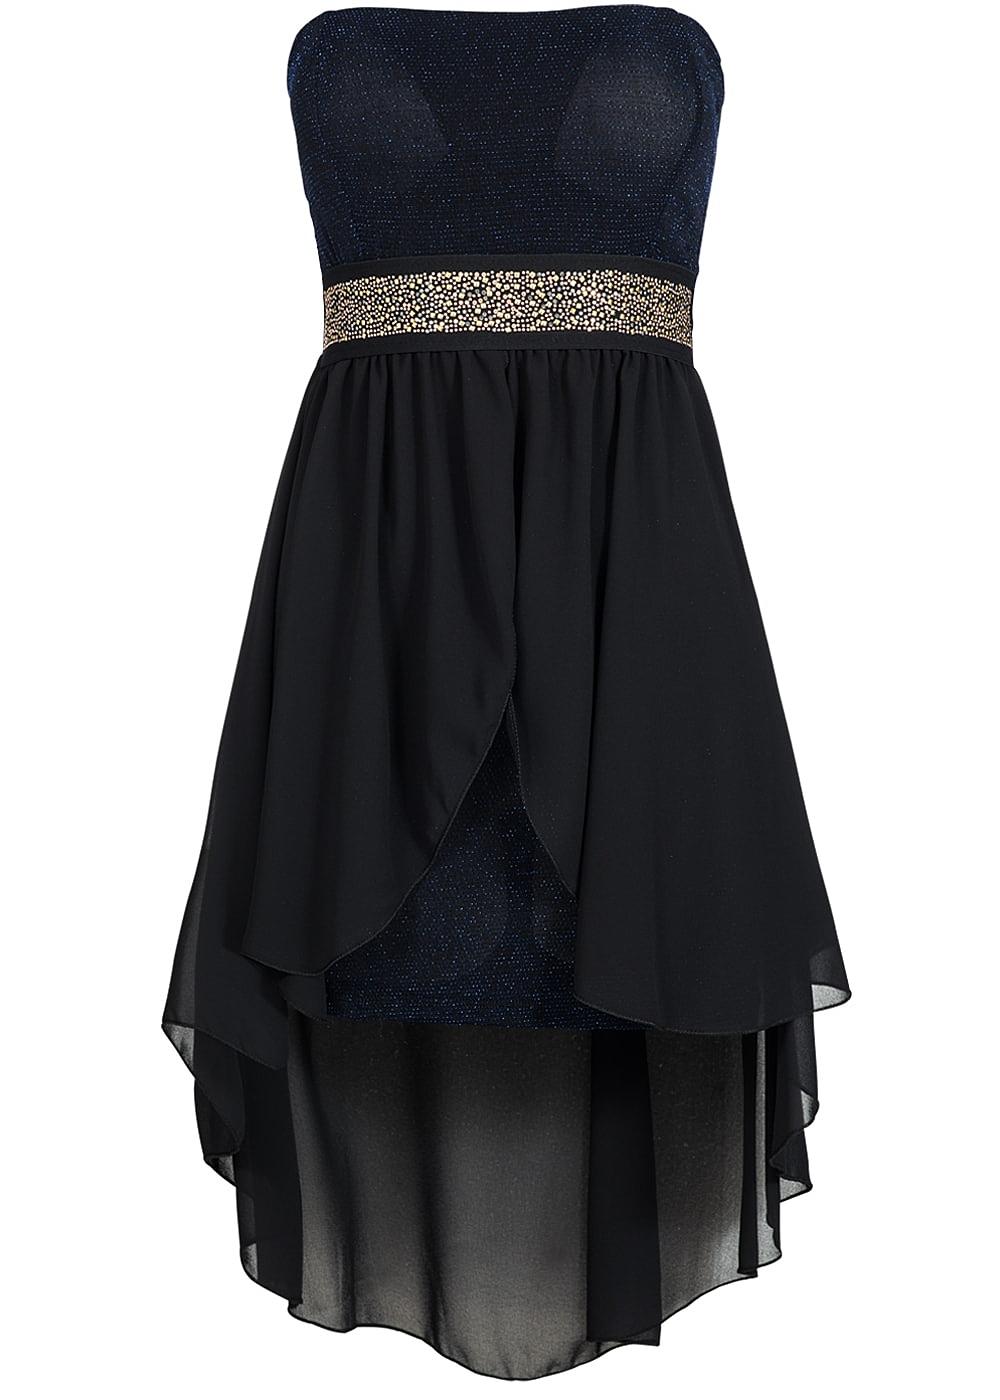 styleboom fashion damen party bandeau kleid vokuhila glitzer brustpads schwarz royal blau. Black Bedroom Furniture Sets. Home Design Ideas